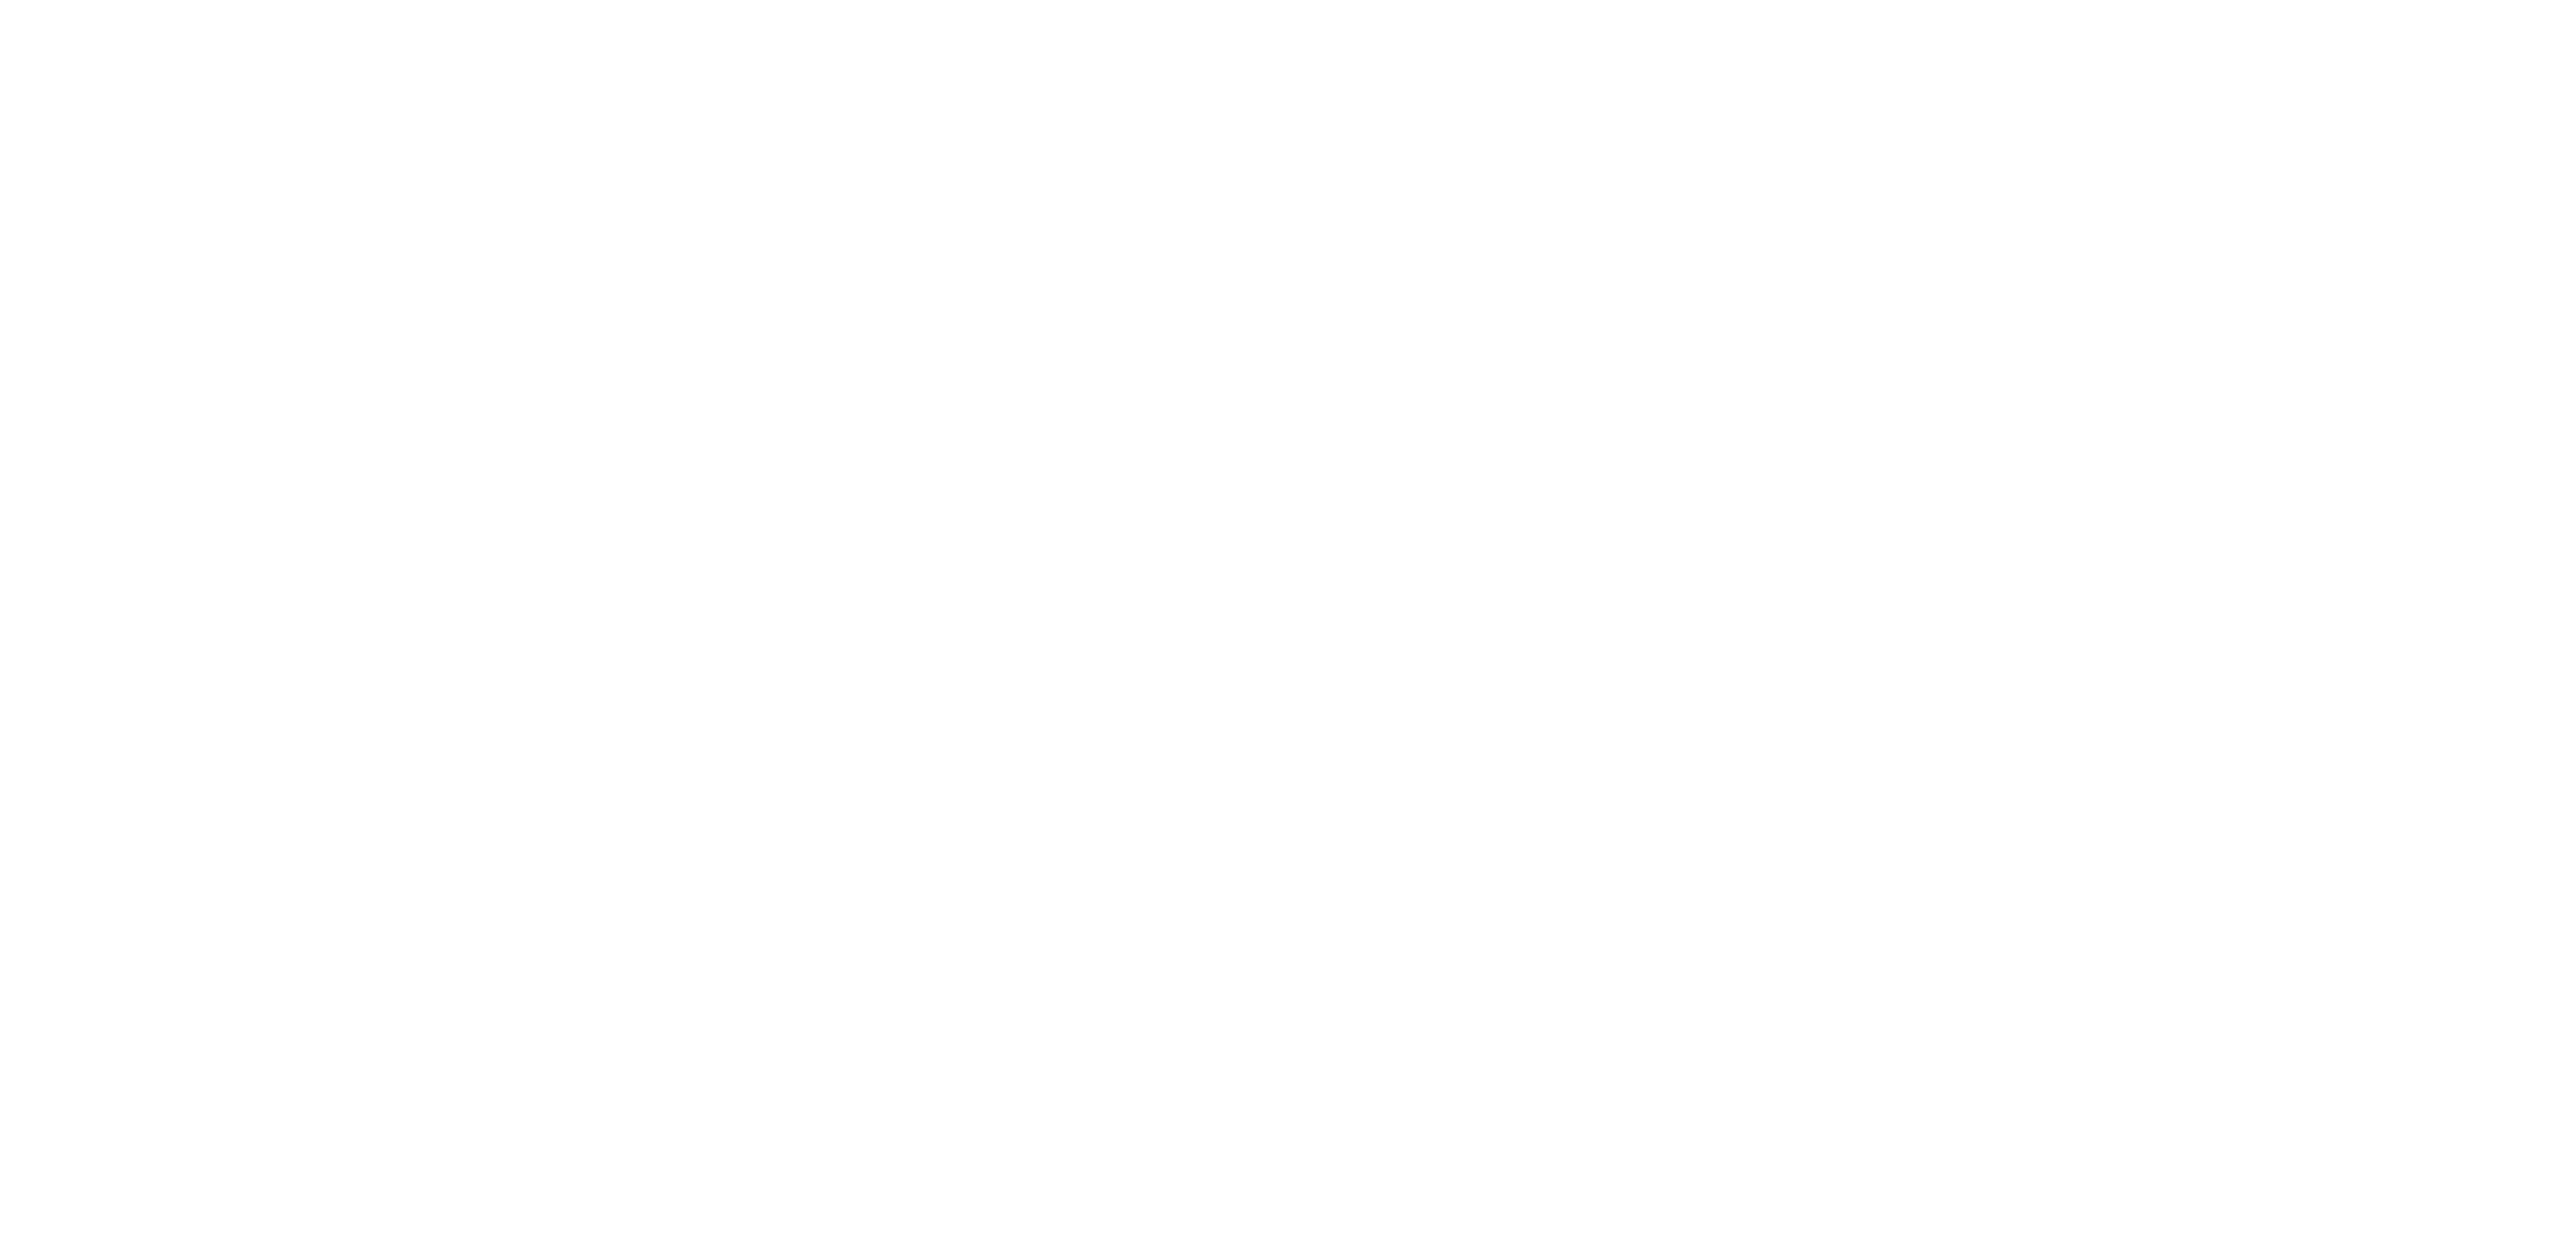 https://tfwoulu.fi/